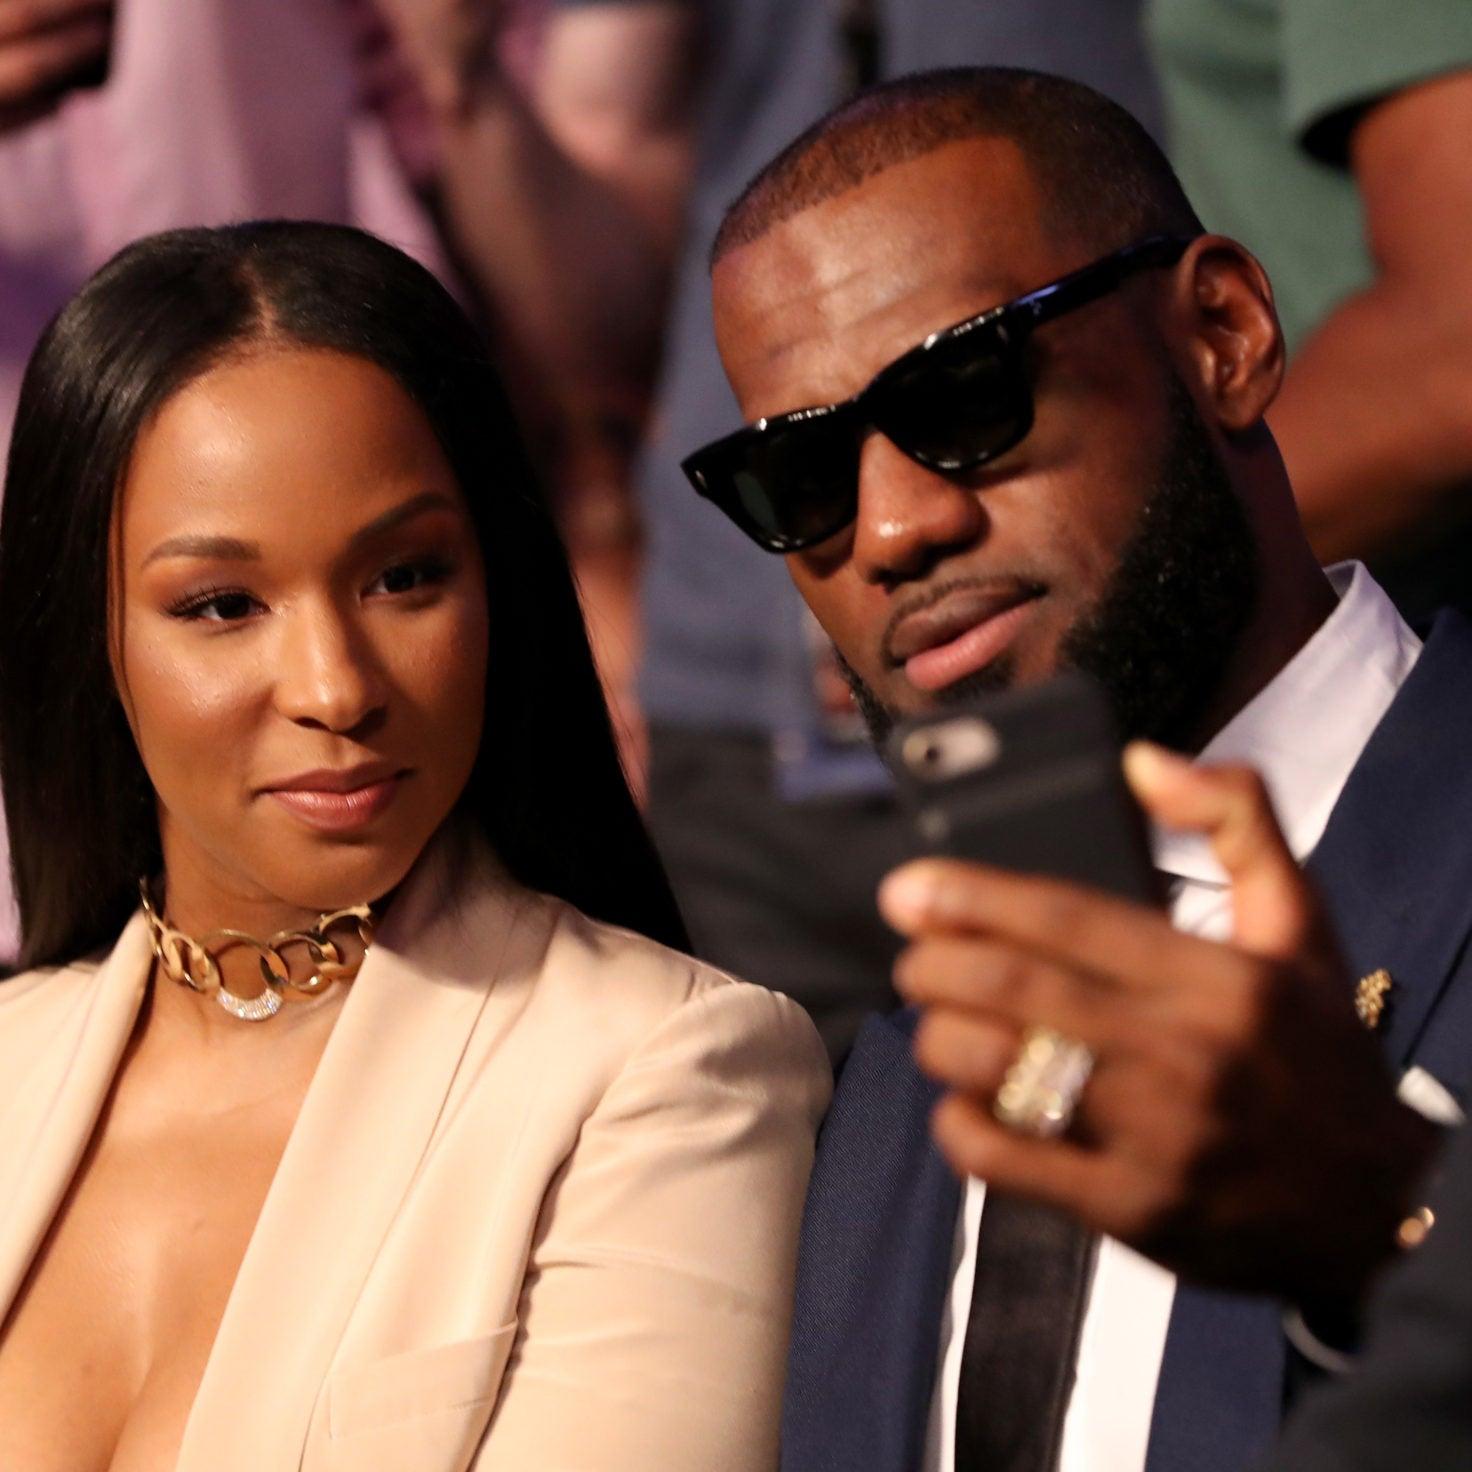 We Love That LeBron James Is His Wife Savannah's Biggest Fan